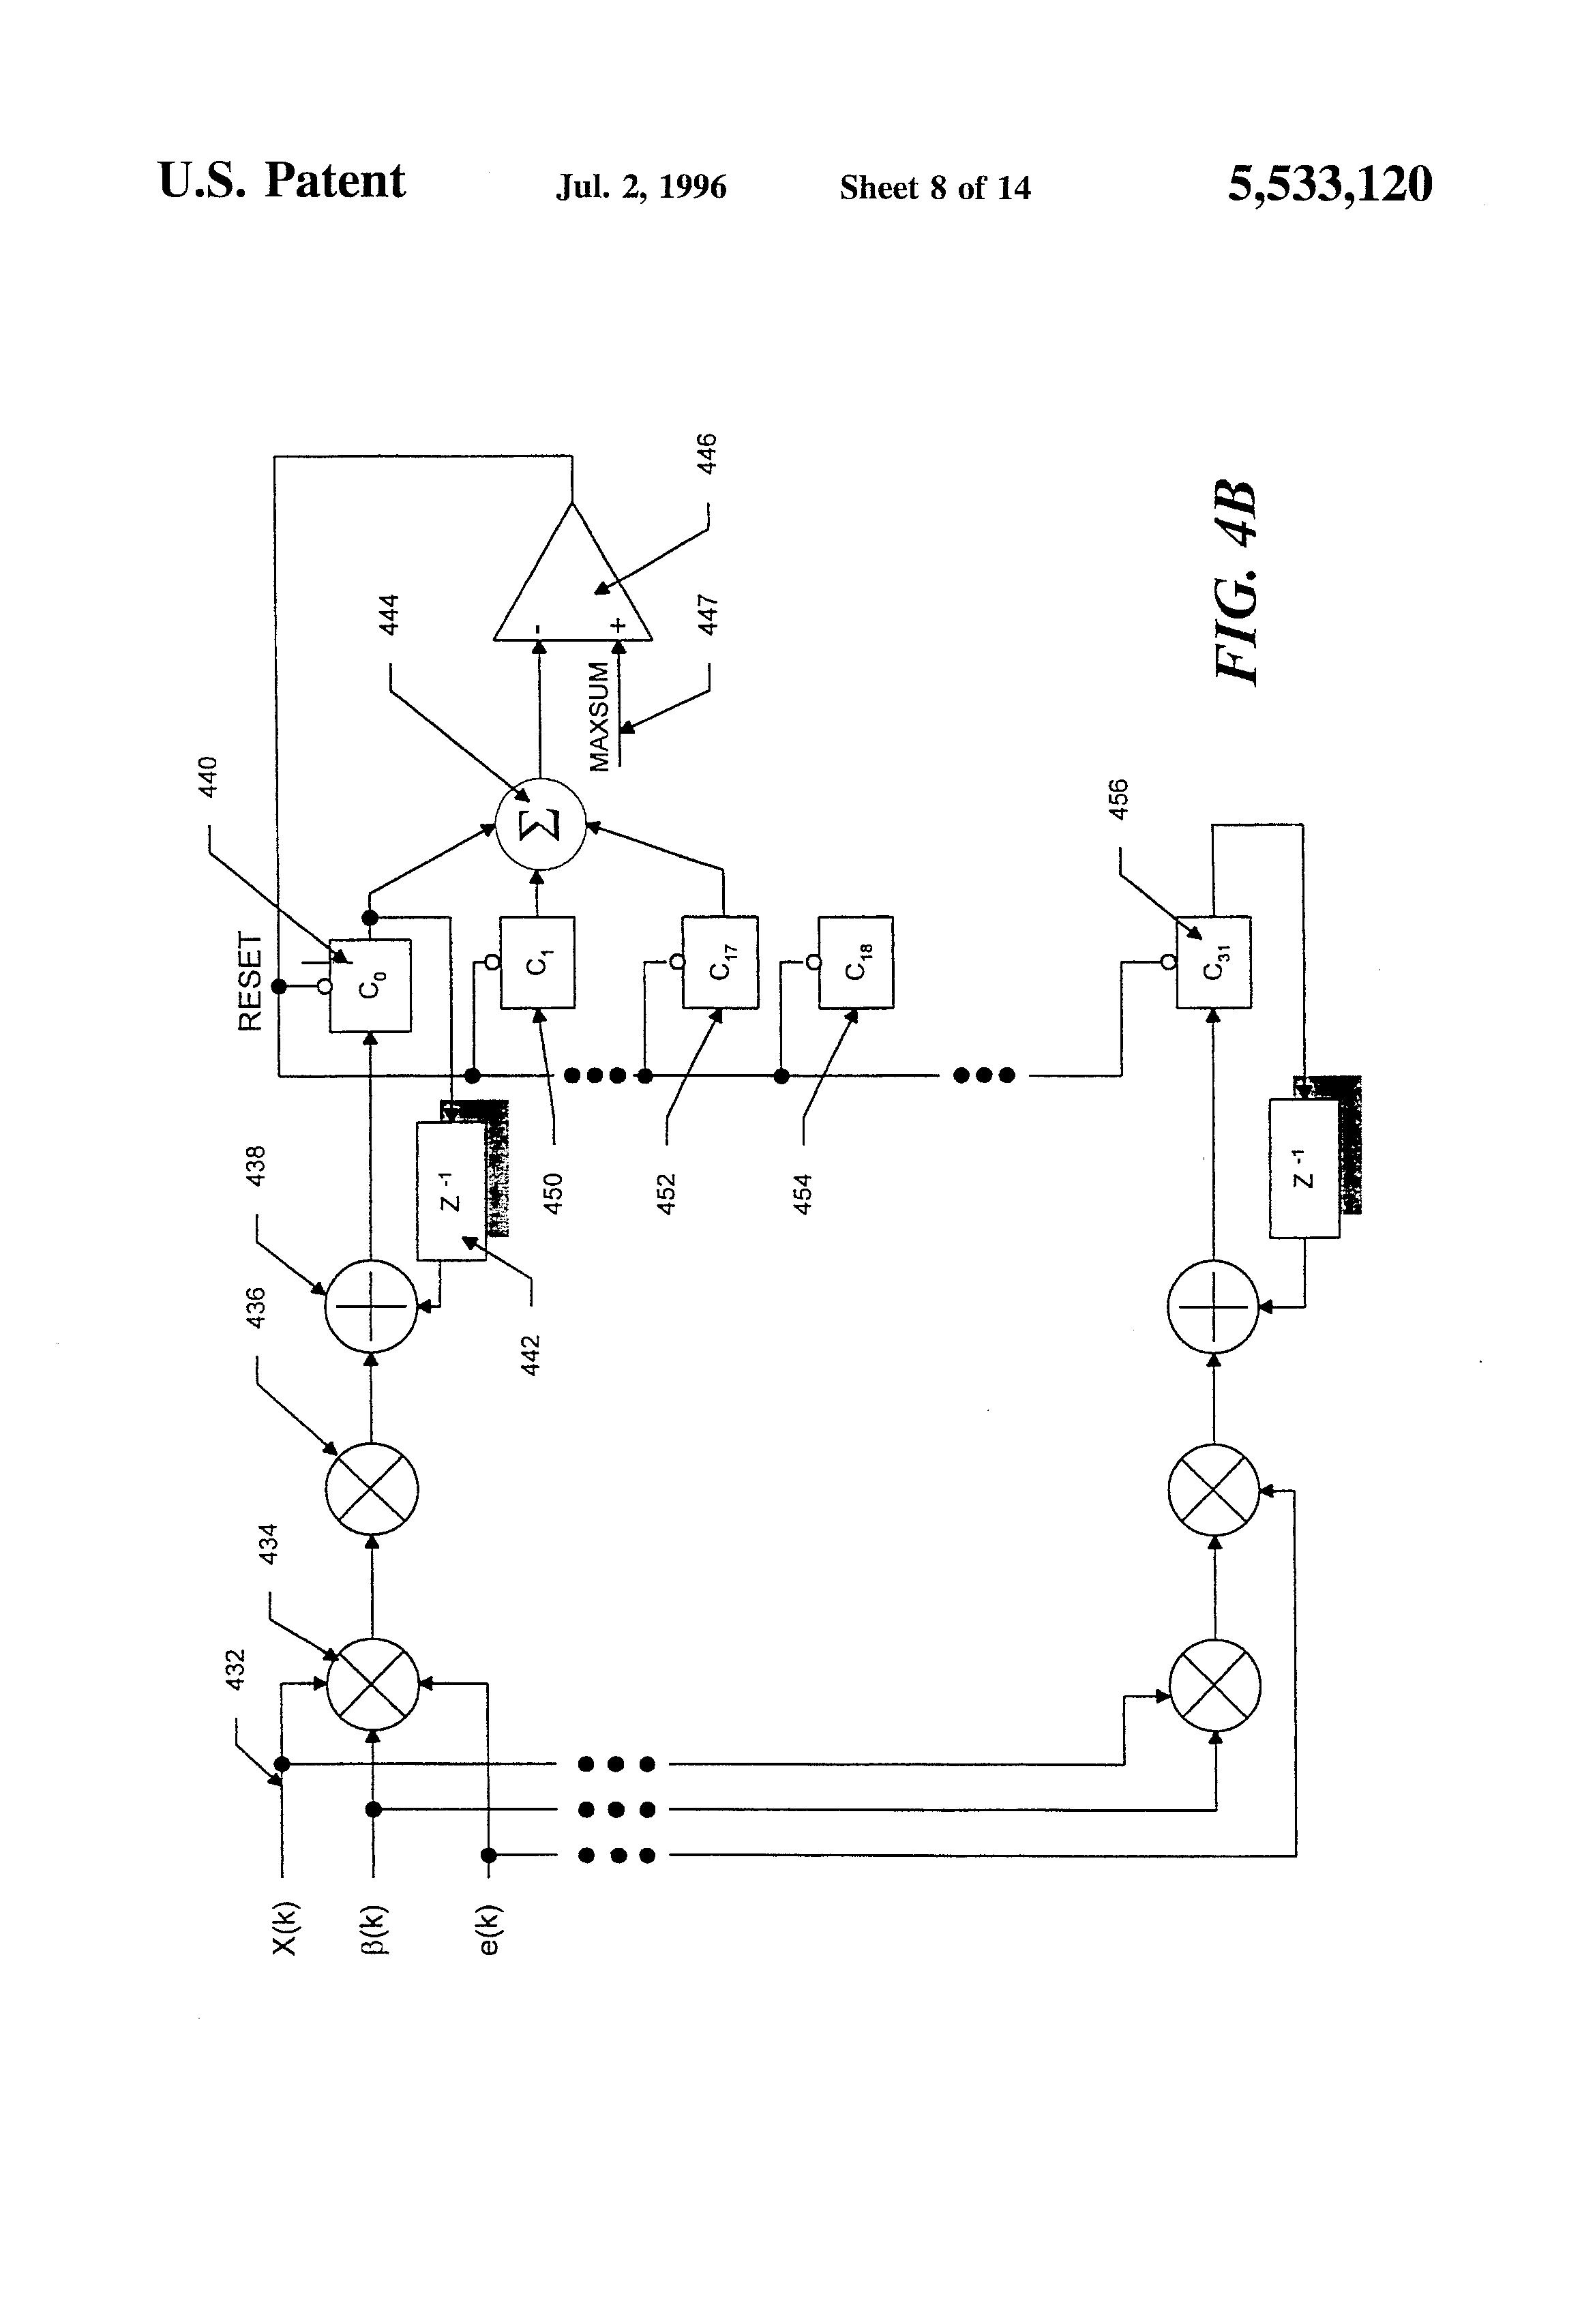 beta wiring diagram wiring wiring diagrams instructions rh ww5 ww w freeautoresponder co Beta Alp 1992 1998 Beta Alp Motorcycle